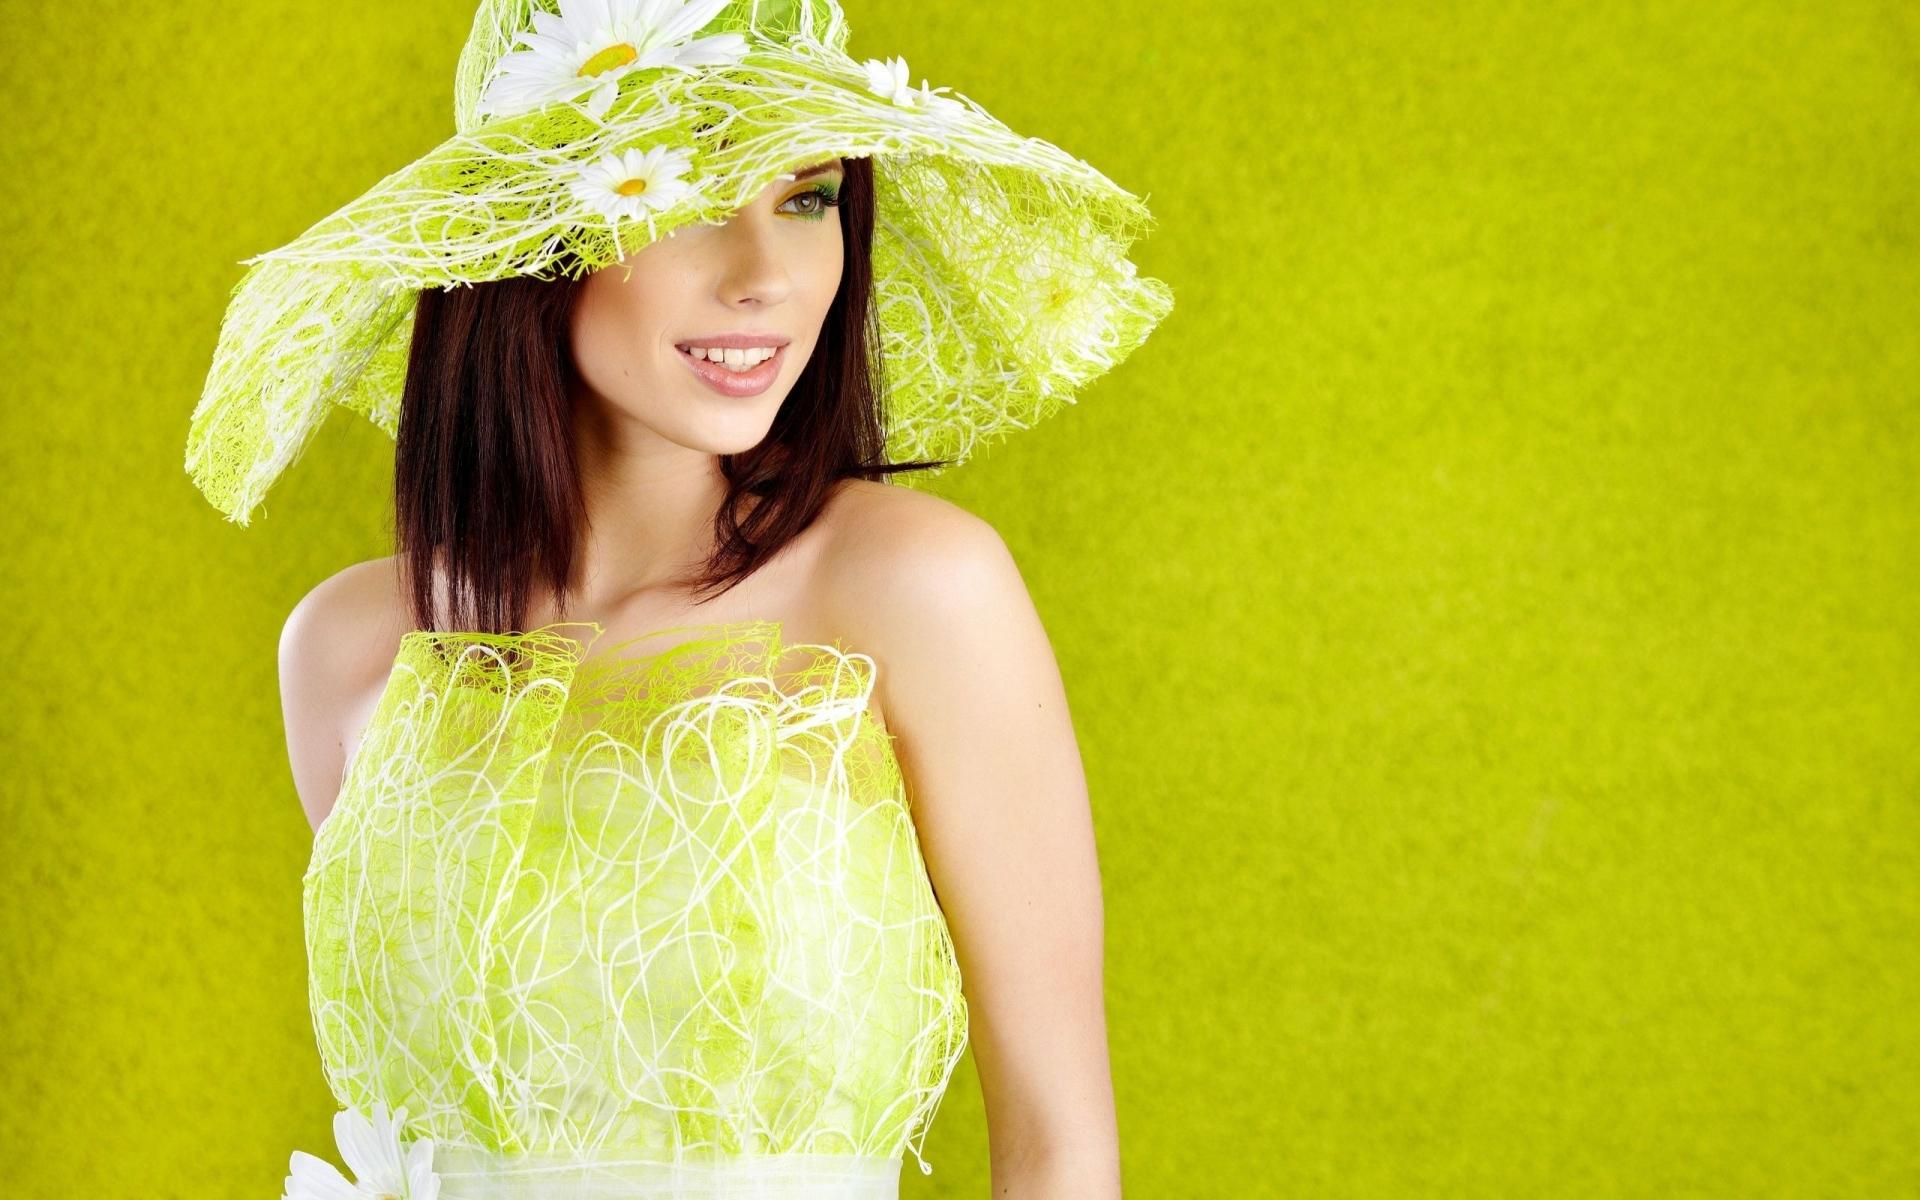 Картинки брюнетка, шляпа, девушка, платье фото и обои на рабочий стол